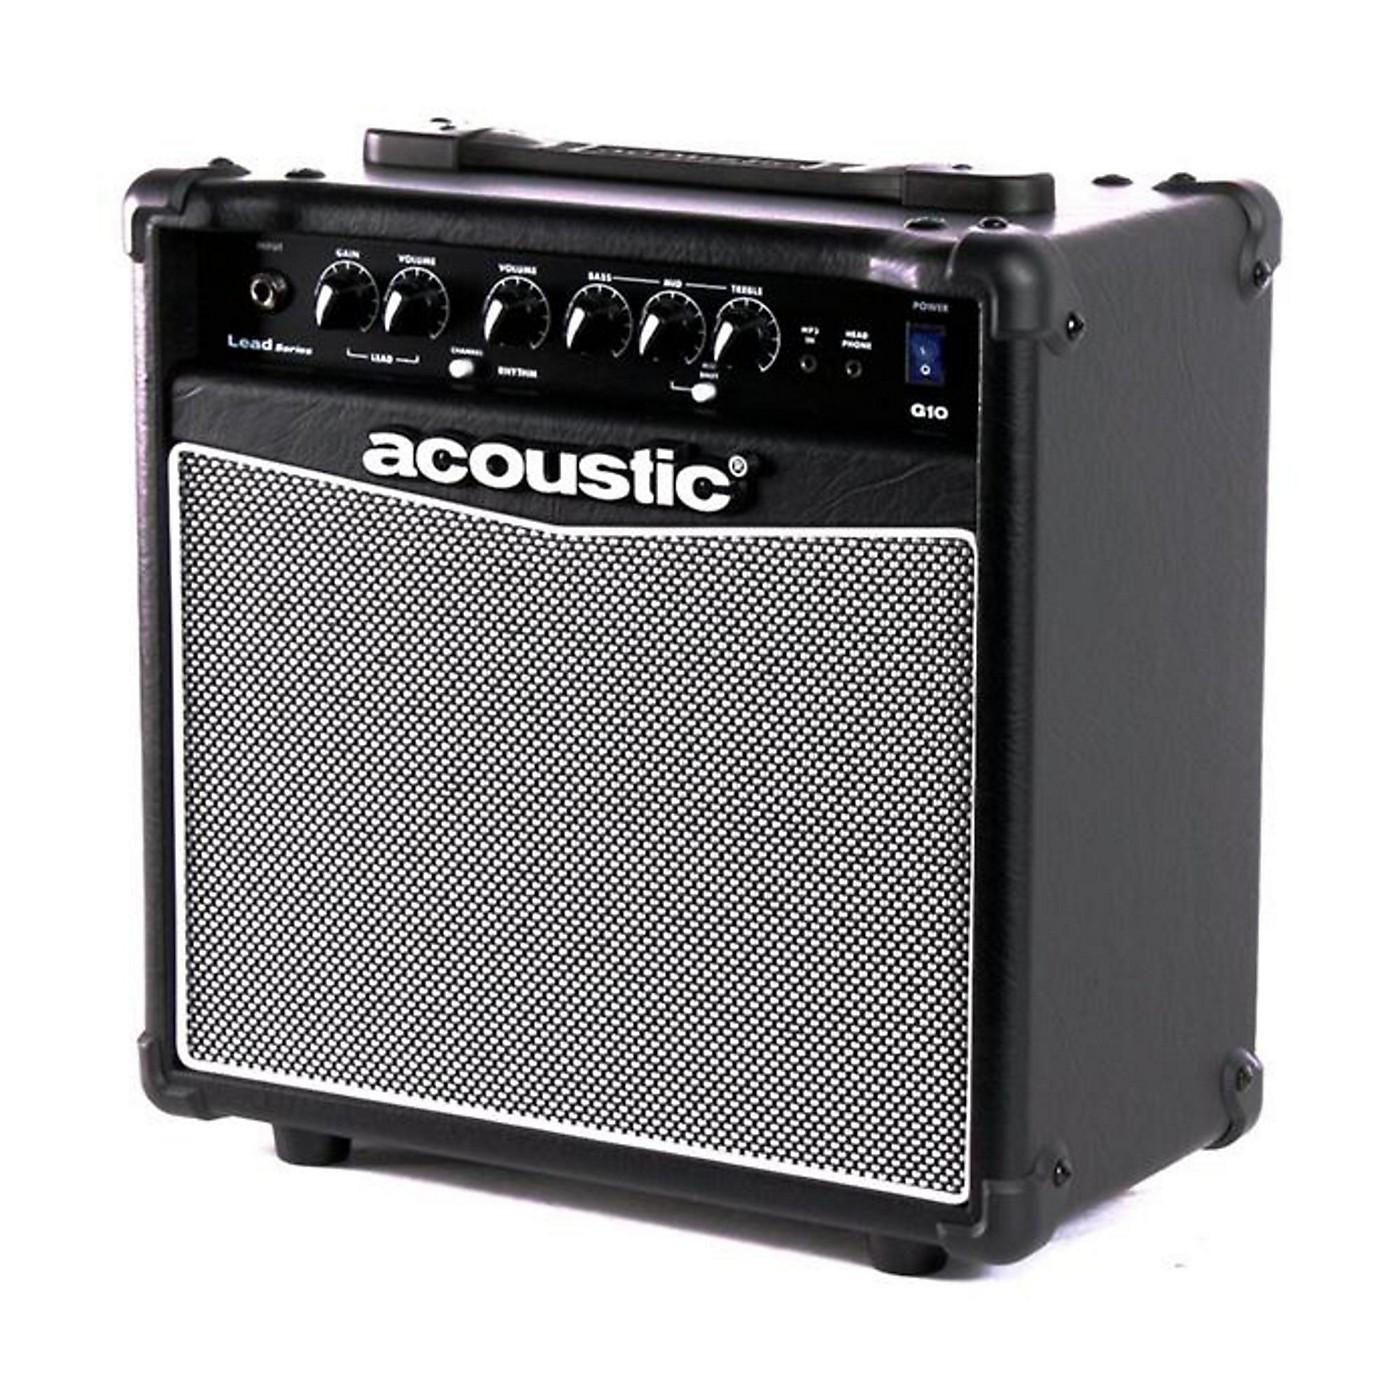 Acoustic Lead Guitar Series G10 10W 1x8 Guitar Combo Amp thumbnail